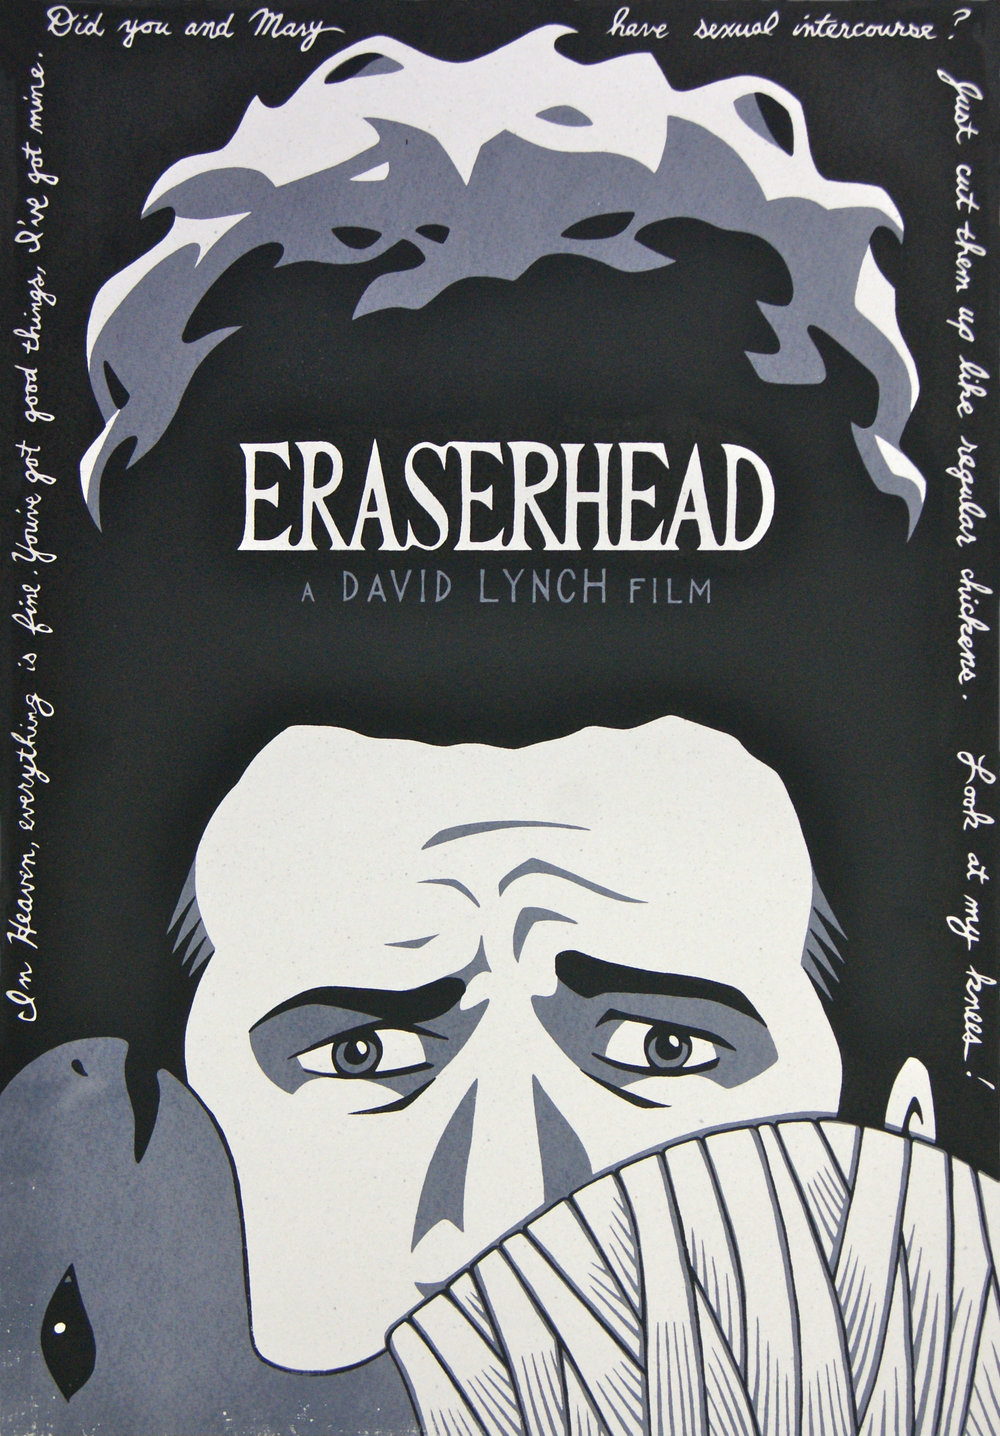 Eraserhead (Film Poster) . Screen Print. 2011. A2